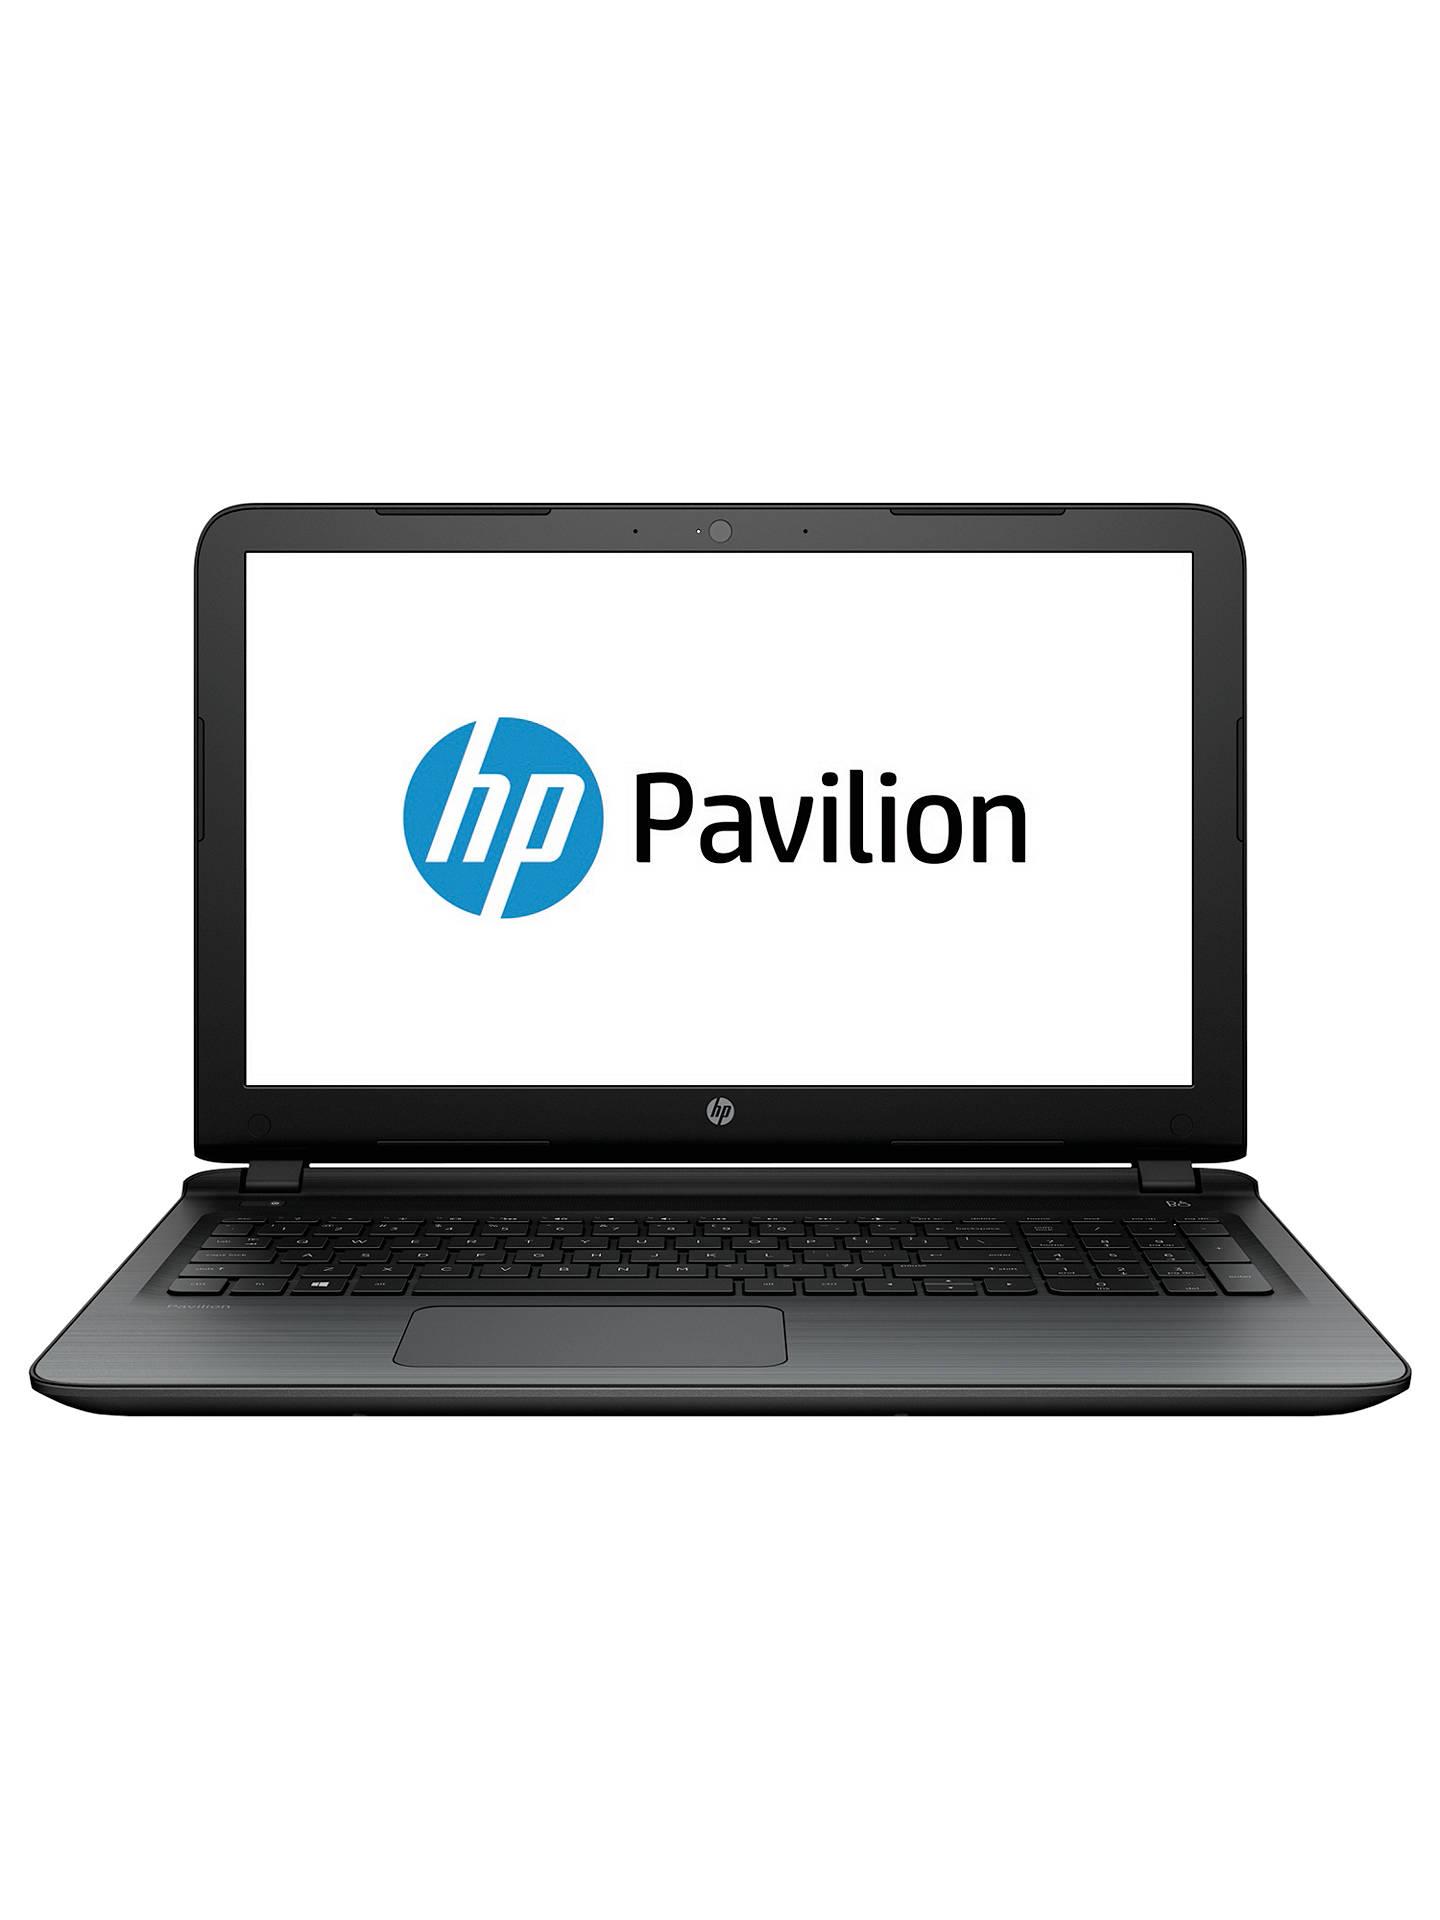 HP Pavilion 15 Ab104na Laptop AMD A10 12GB RAM 1TB 15